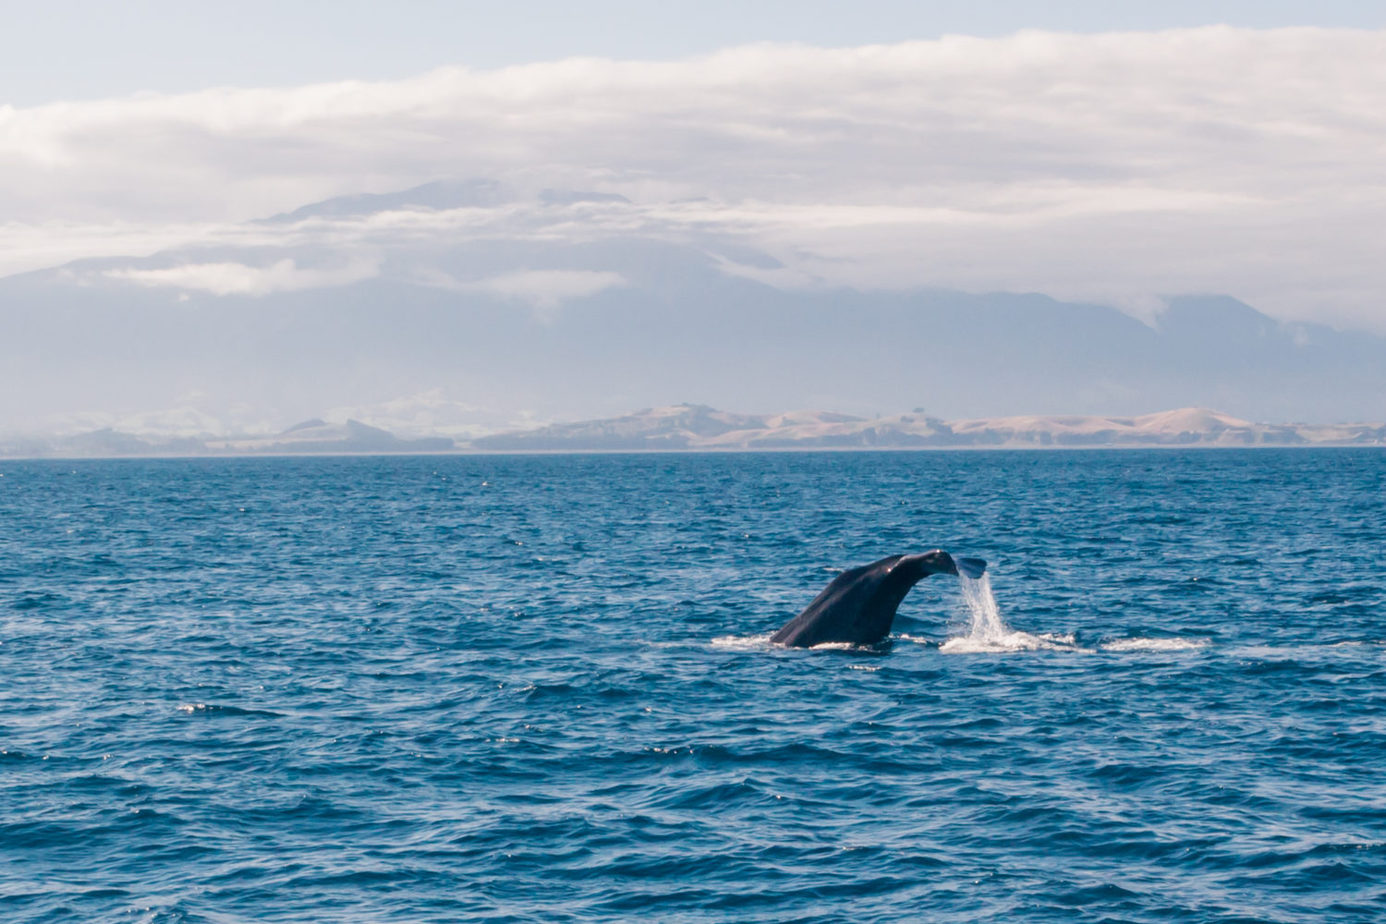 wildlife_in_New_Zealand_Kaikoura_visit_spermwhales_bluewhales_dolphins_wildlife